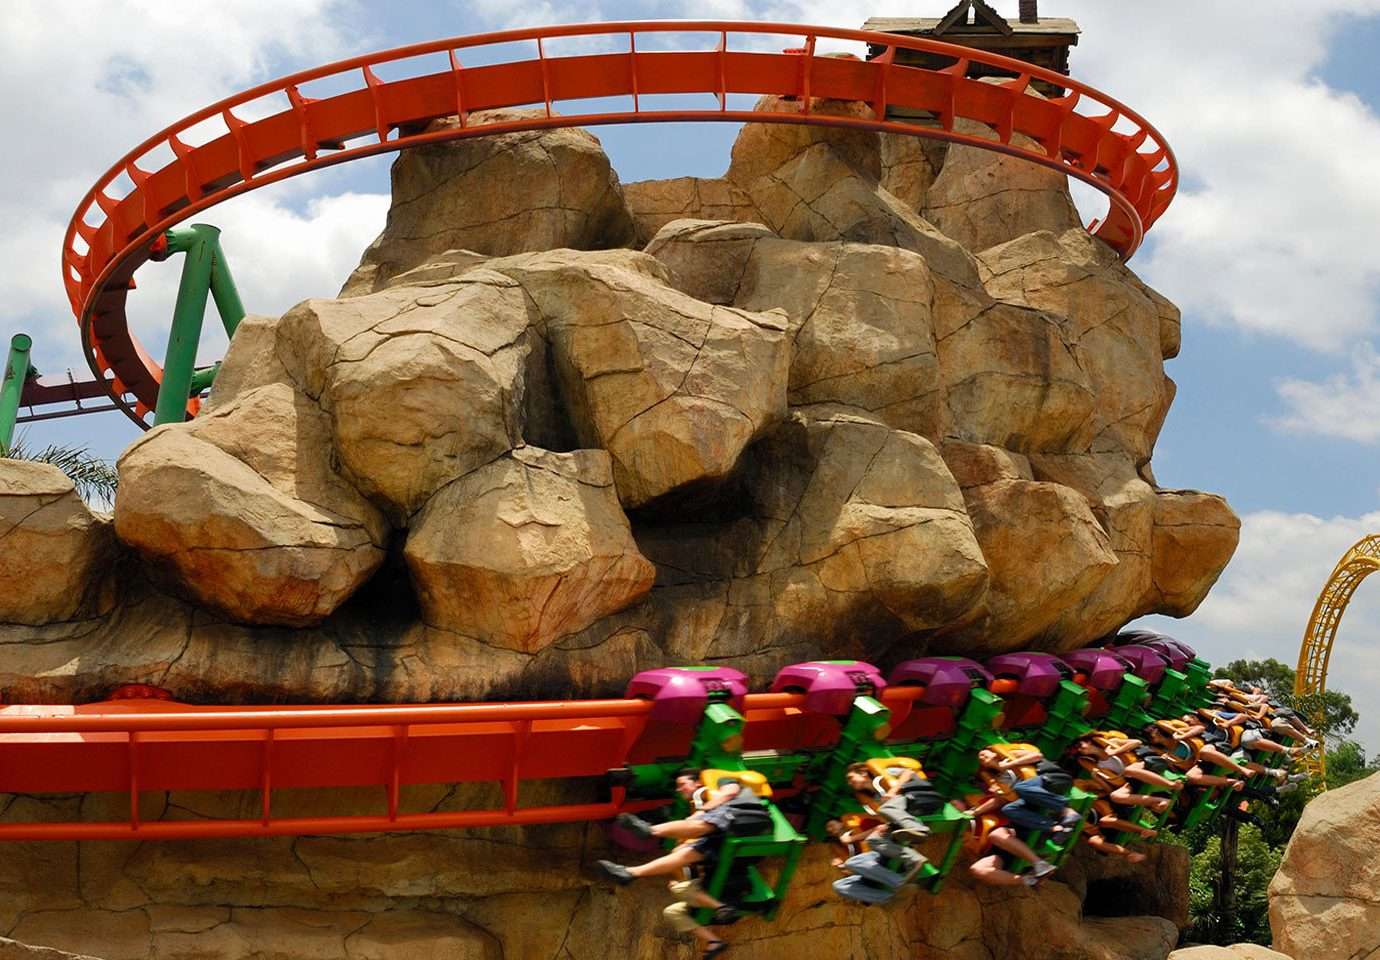 City Johannesburg South Africa Trip Ideas sky outdoor rock amusement park tourism tourist attraction recreation leisure tree stone park roller coaster